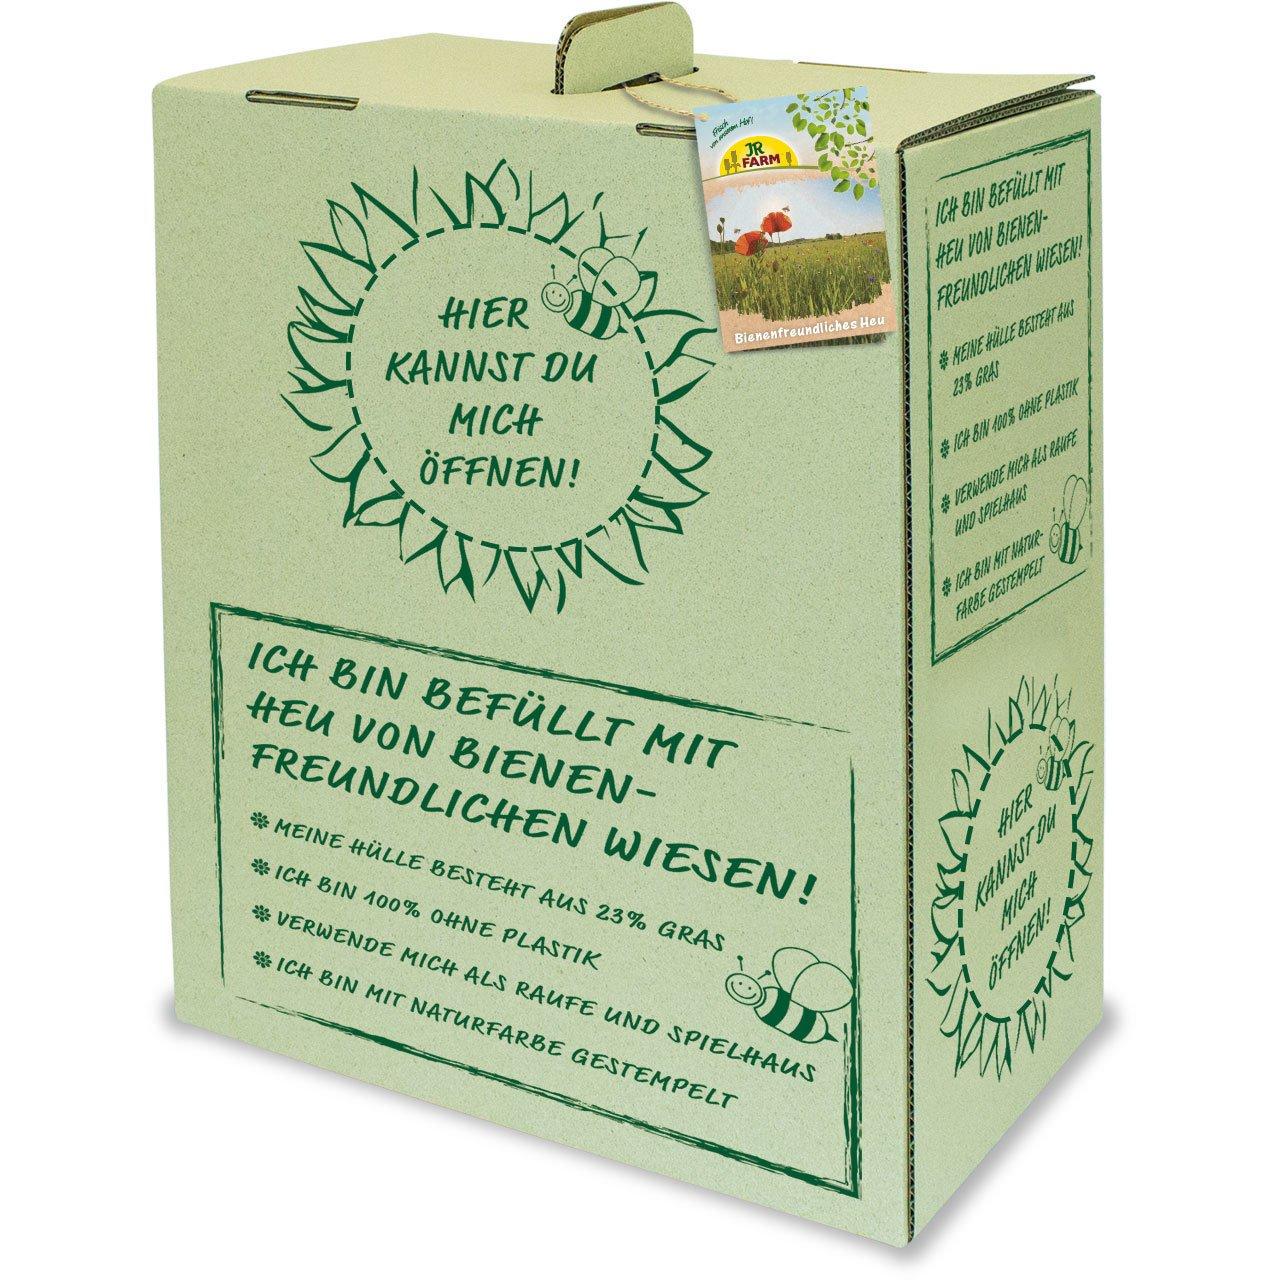 JR Farm Bienenfreundliches Heu, 1 kg